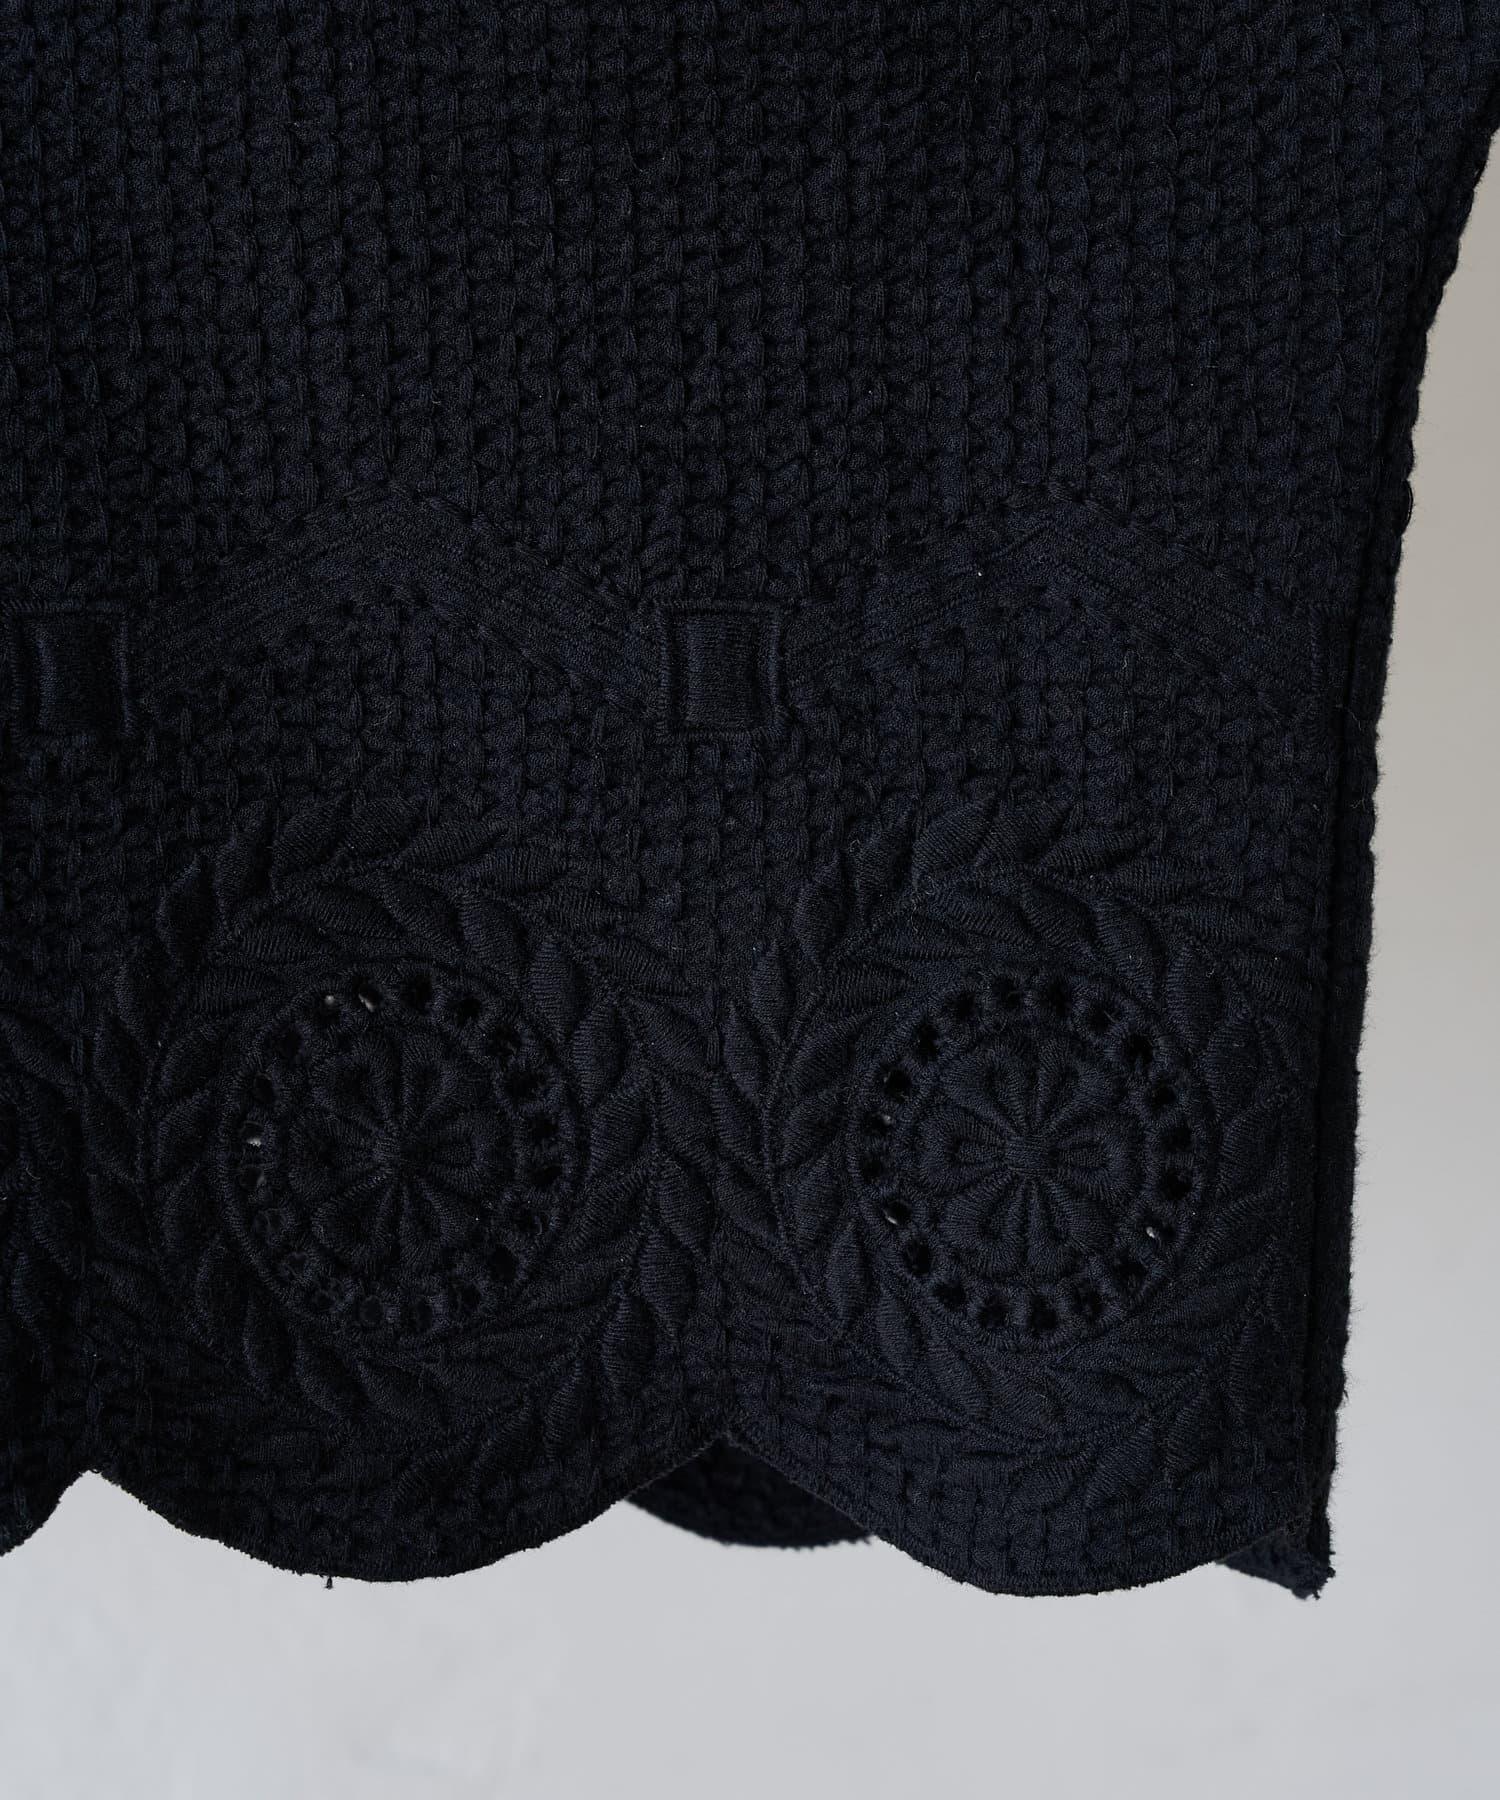 BEARDSLEY(ビアズリー) 《羽織にもなる》刺繍プルオーバーブラウス